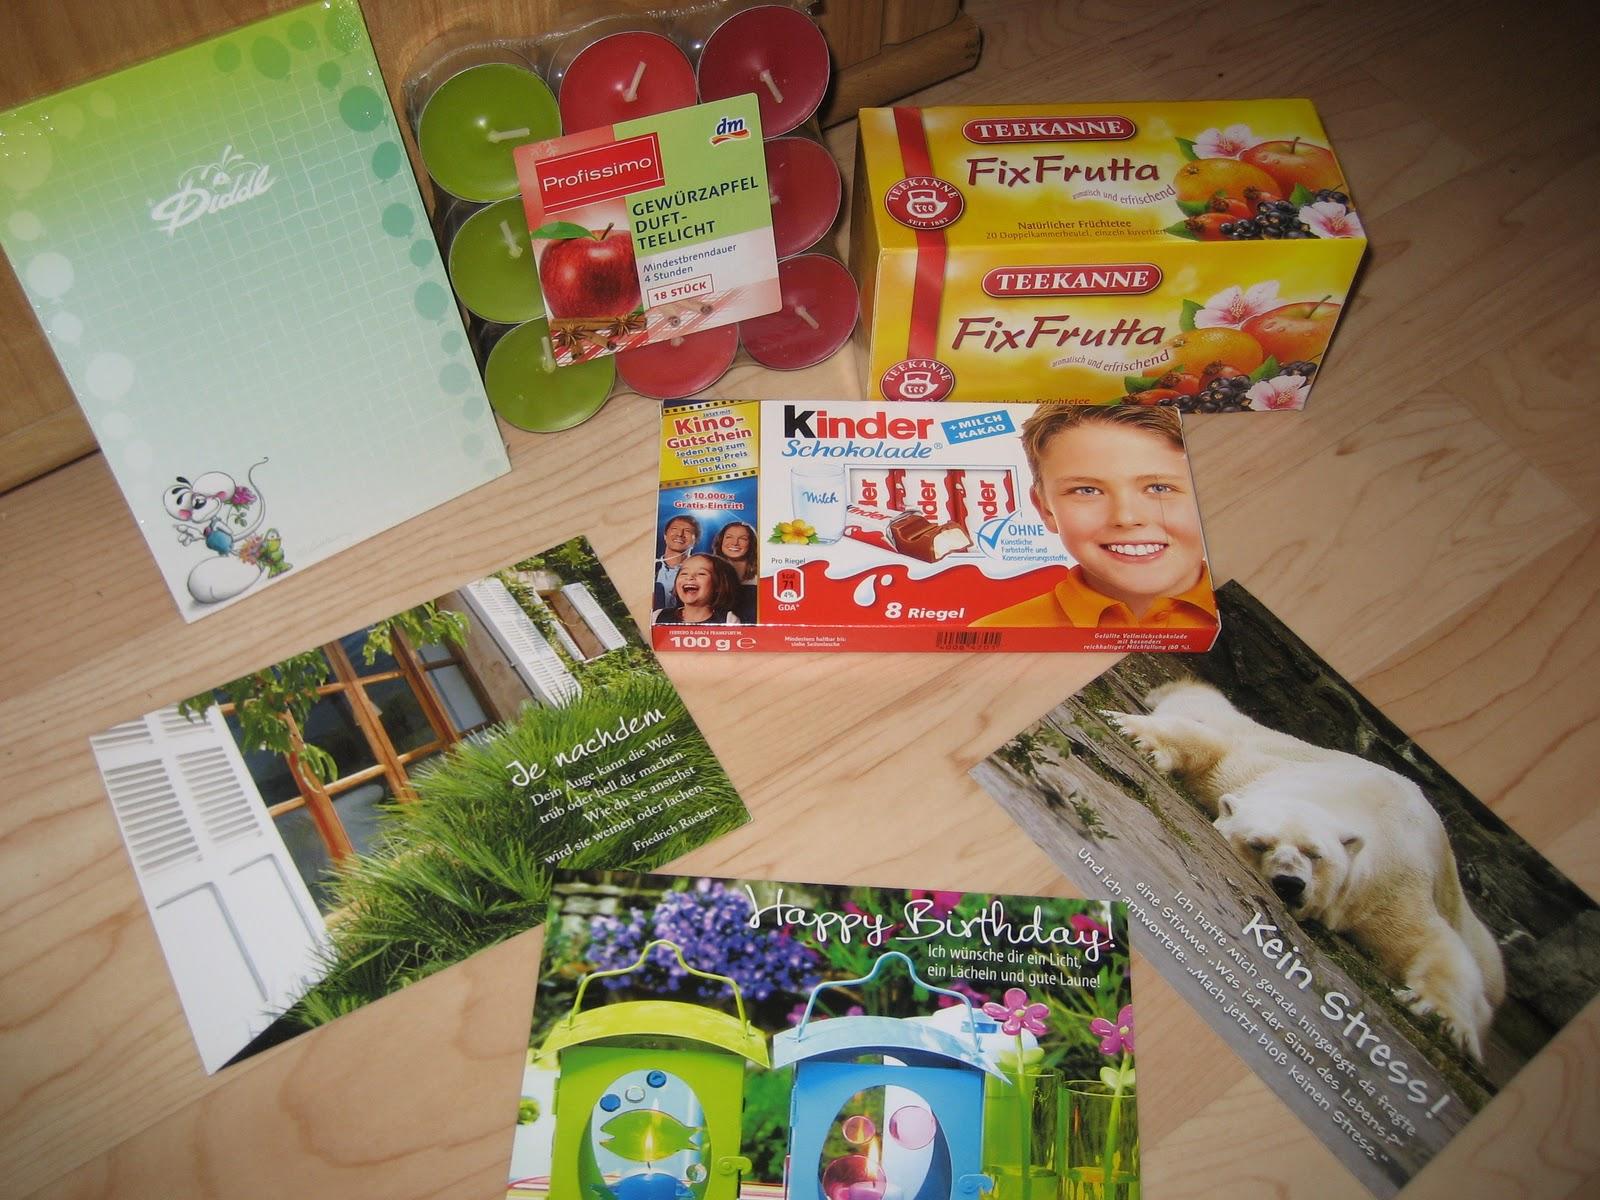 Selene~Niniel: Meine Geburtstagsgeschenke :)